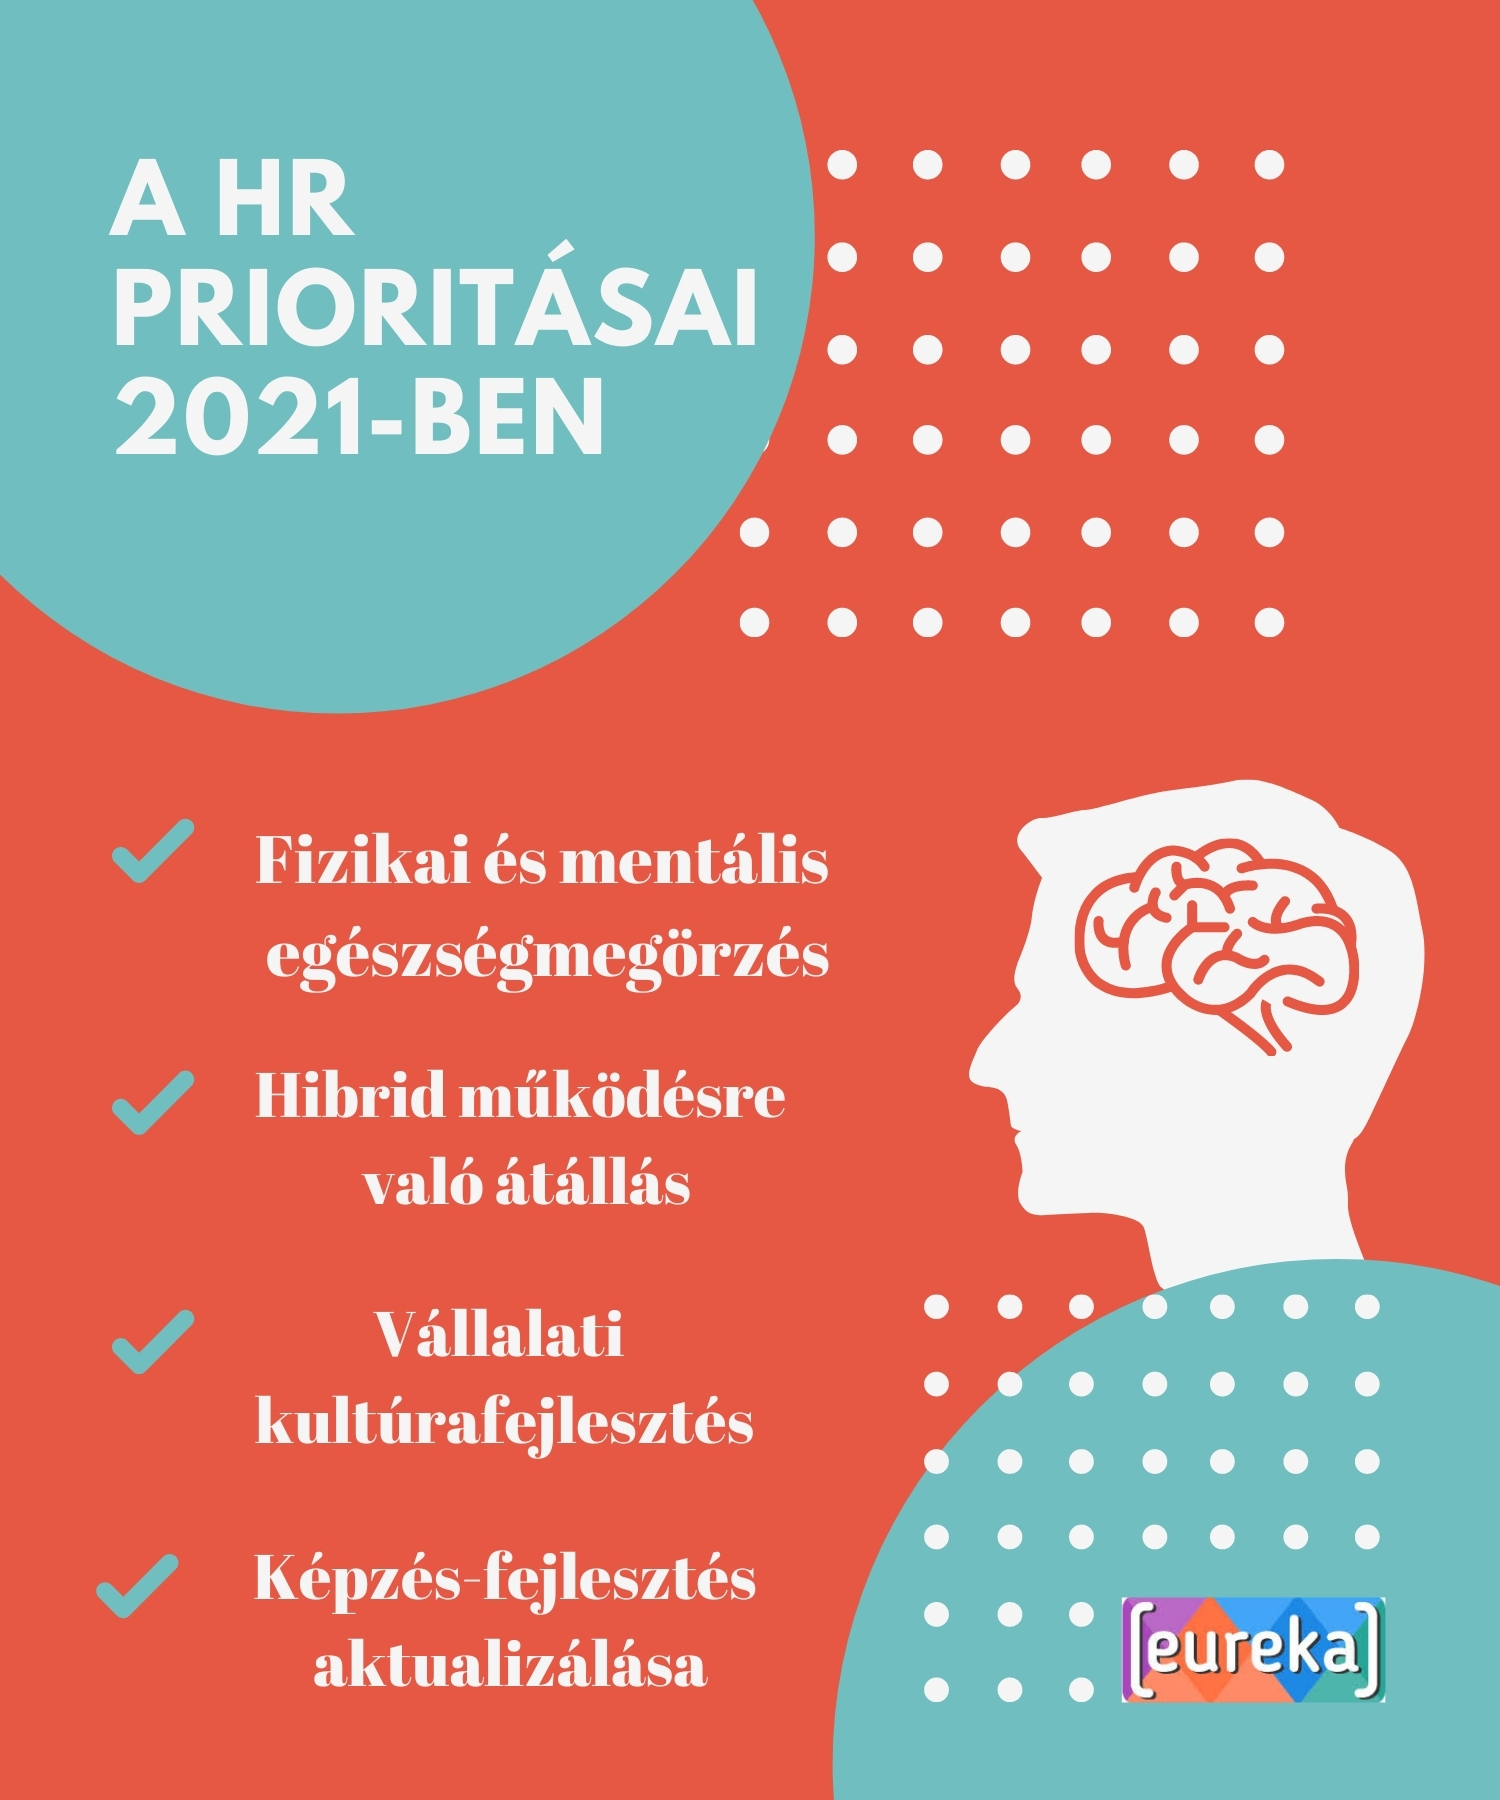 a_hr_prioritasai_2021-ben.jpg